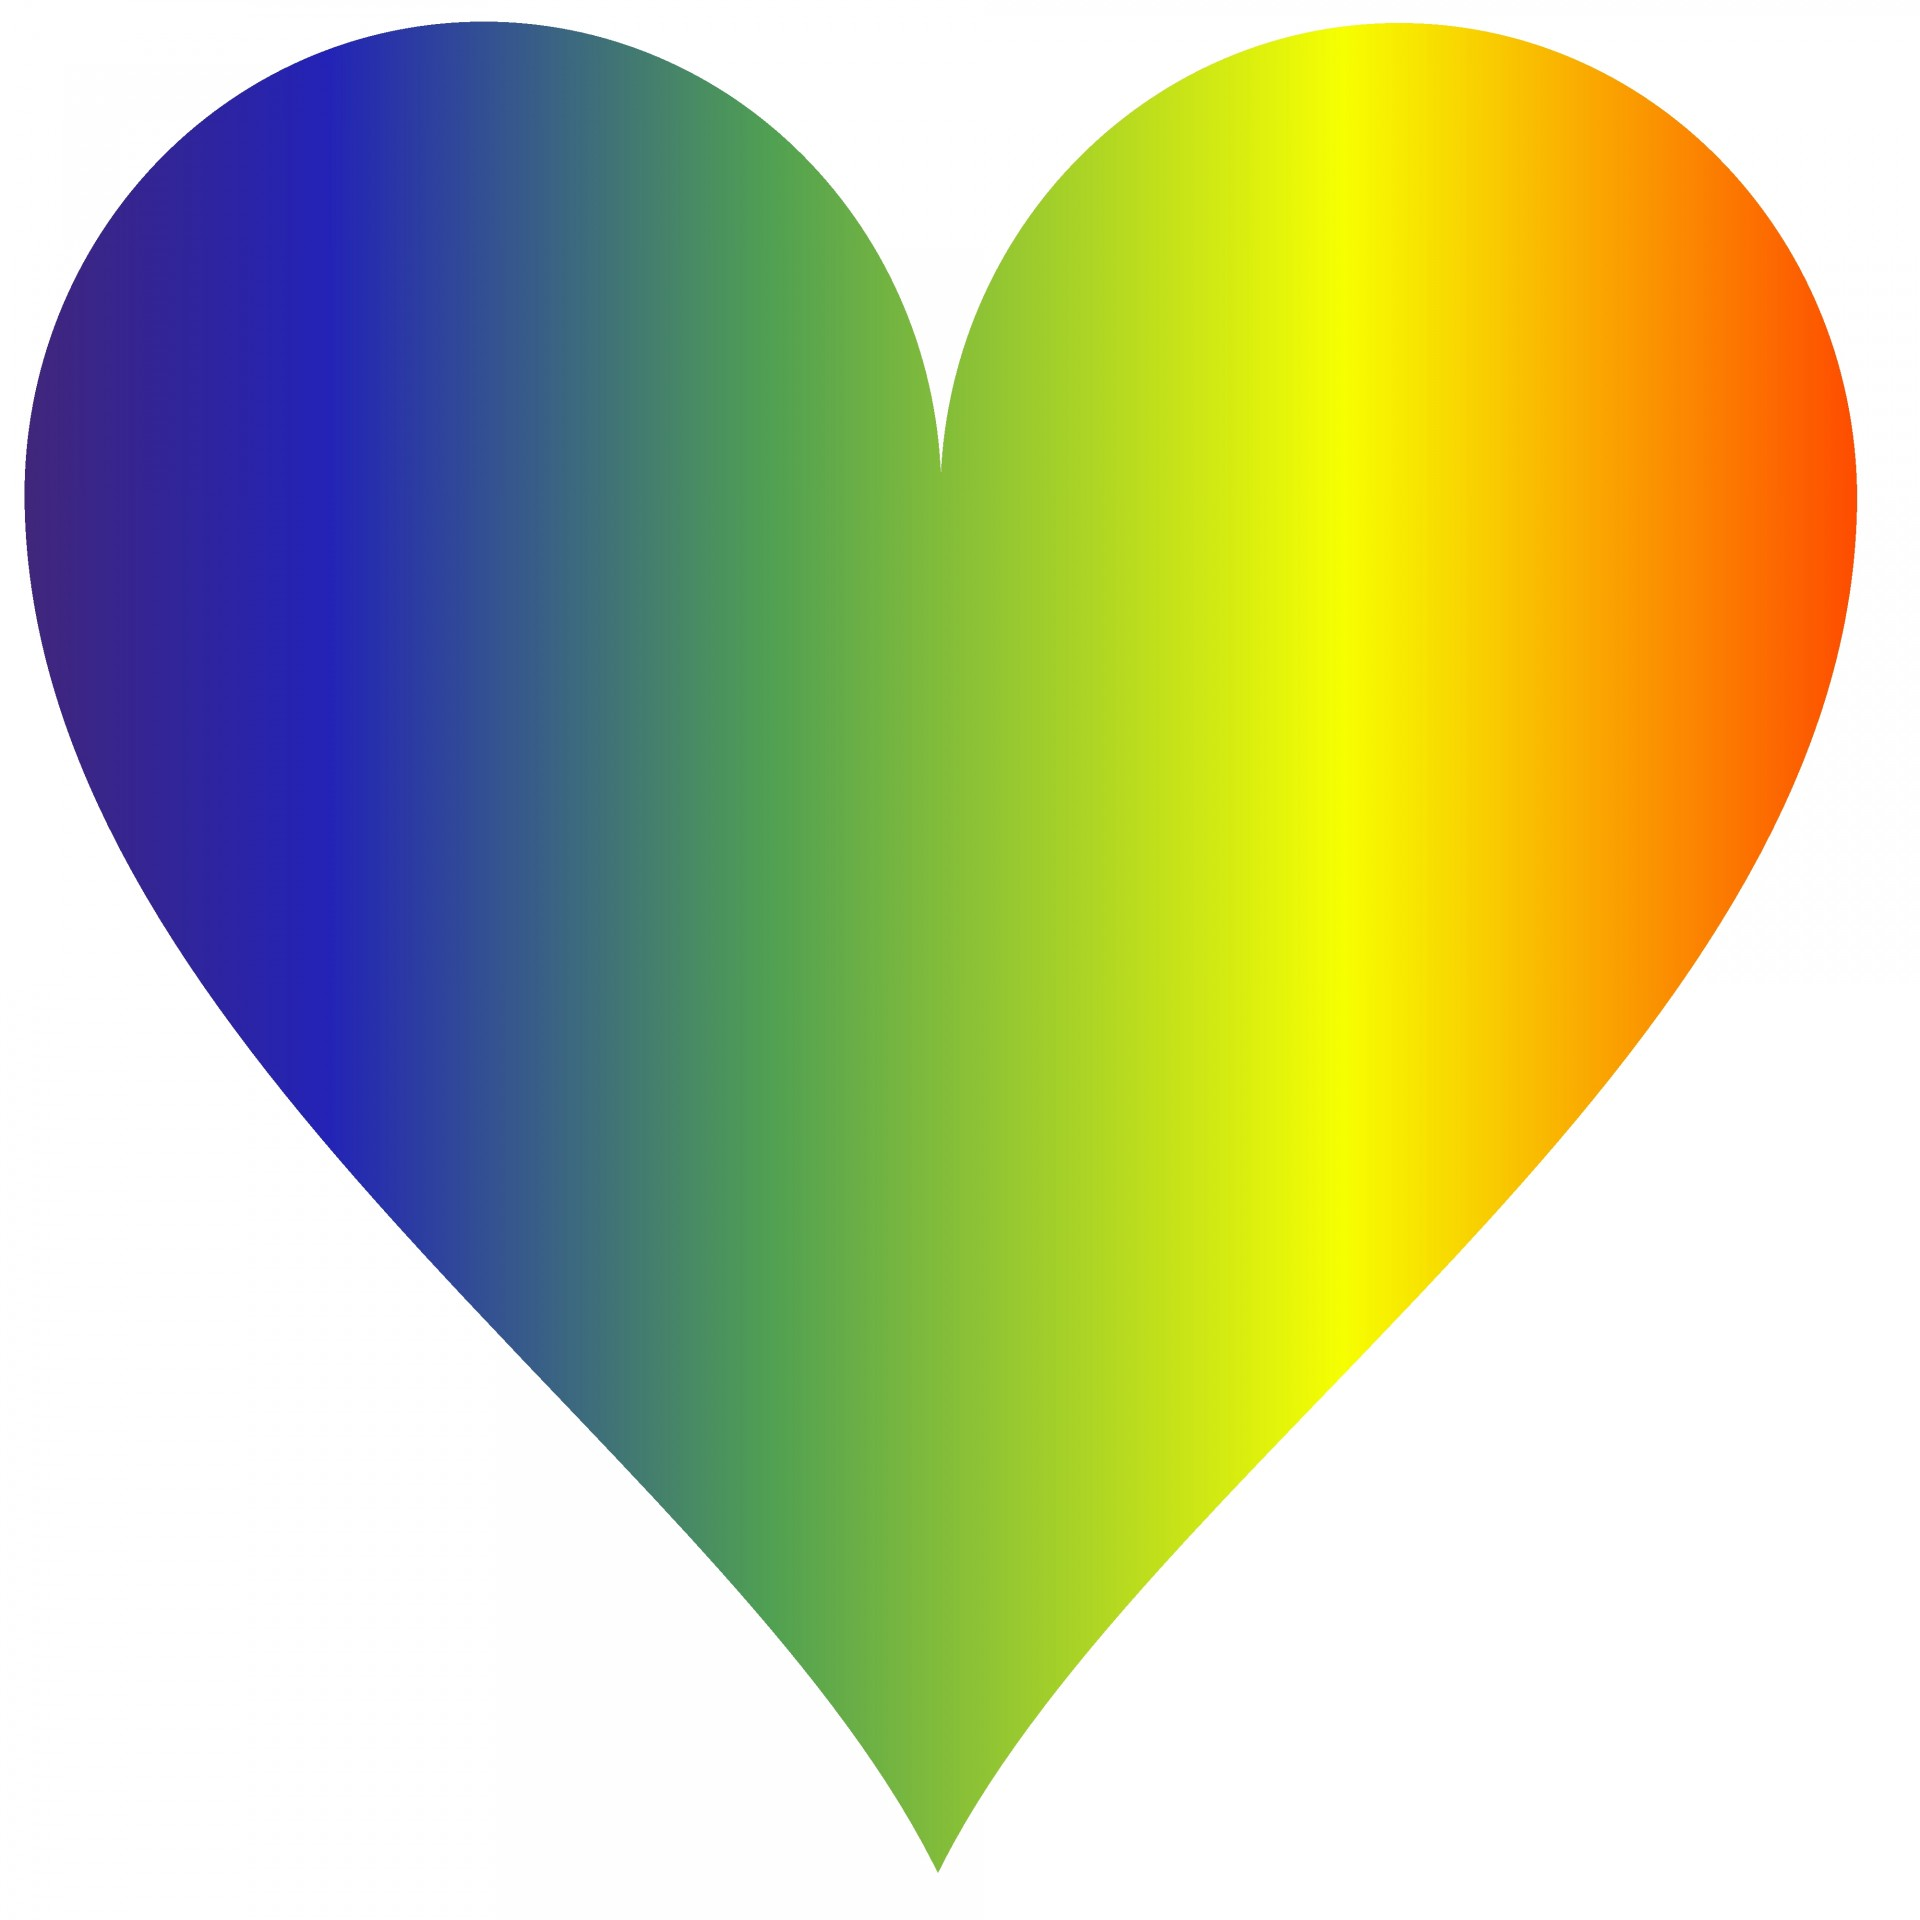 Rainbow Heart 3 Free Stock Photo Public Domain Pictures